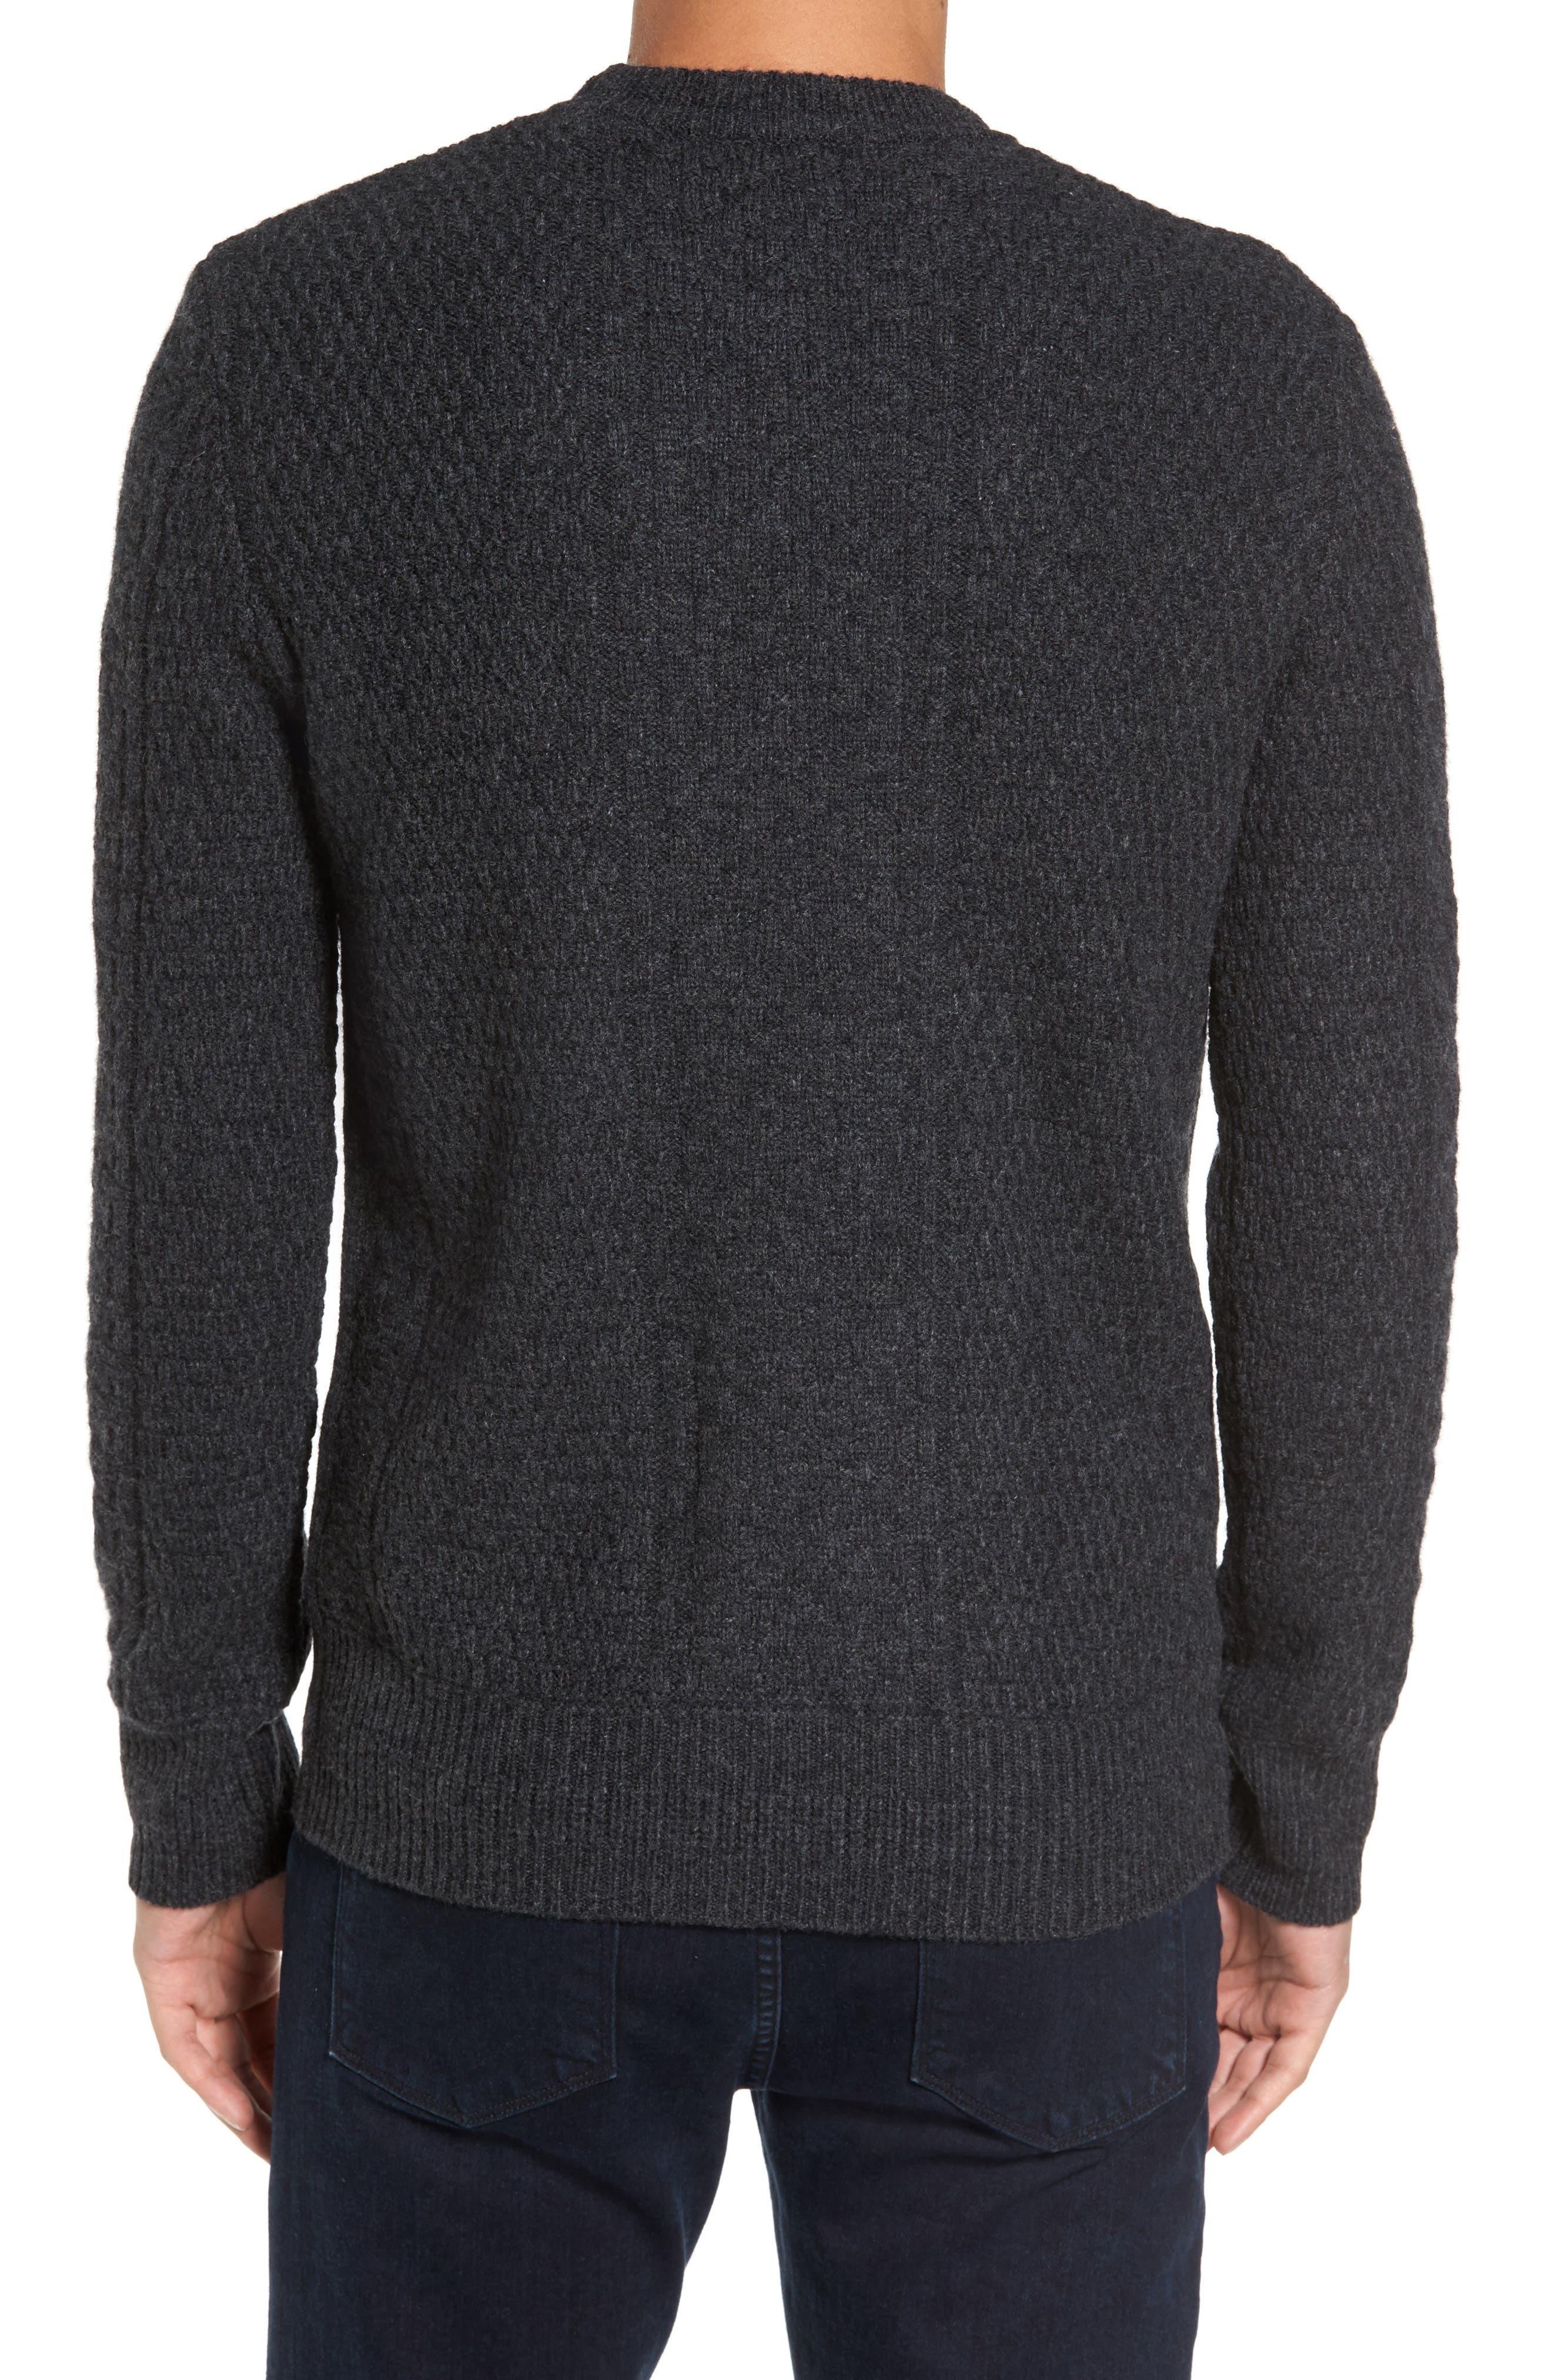 Wool Crewneck Sweater,                             Alternate thumbnail 2, color,                             020